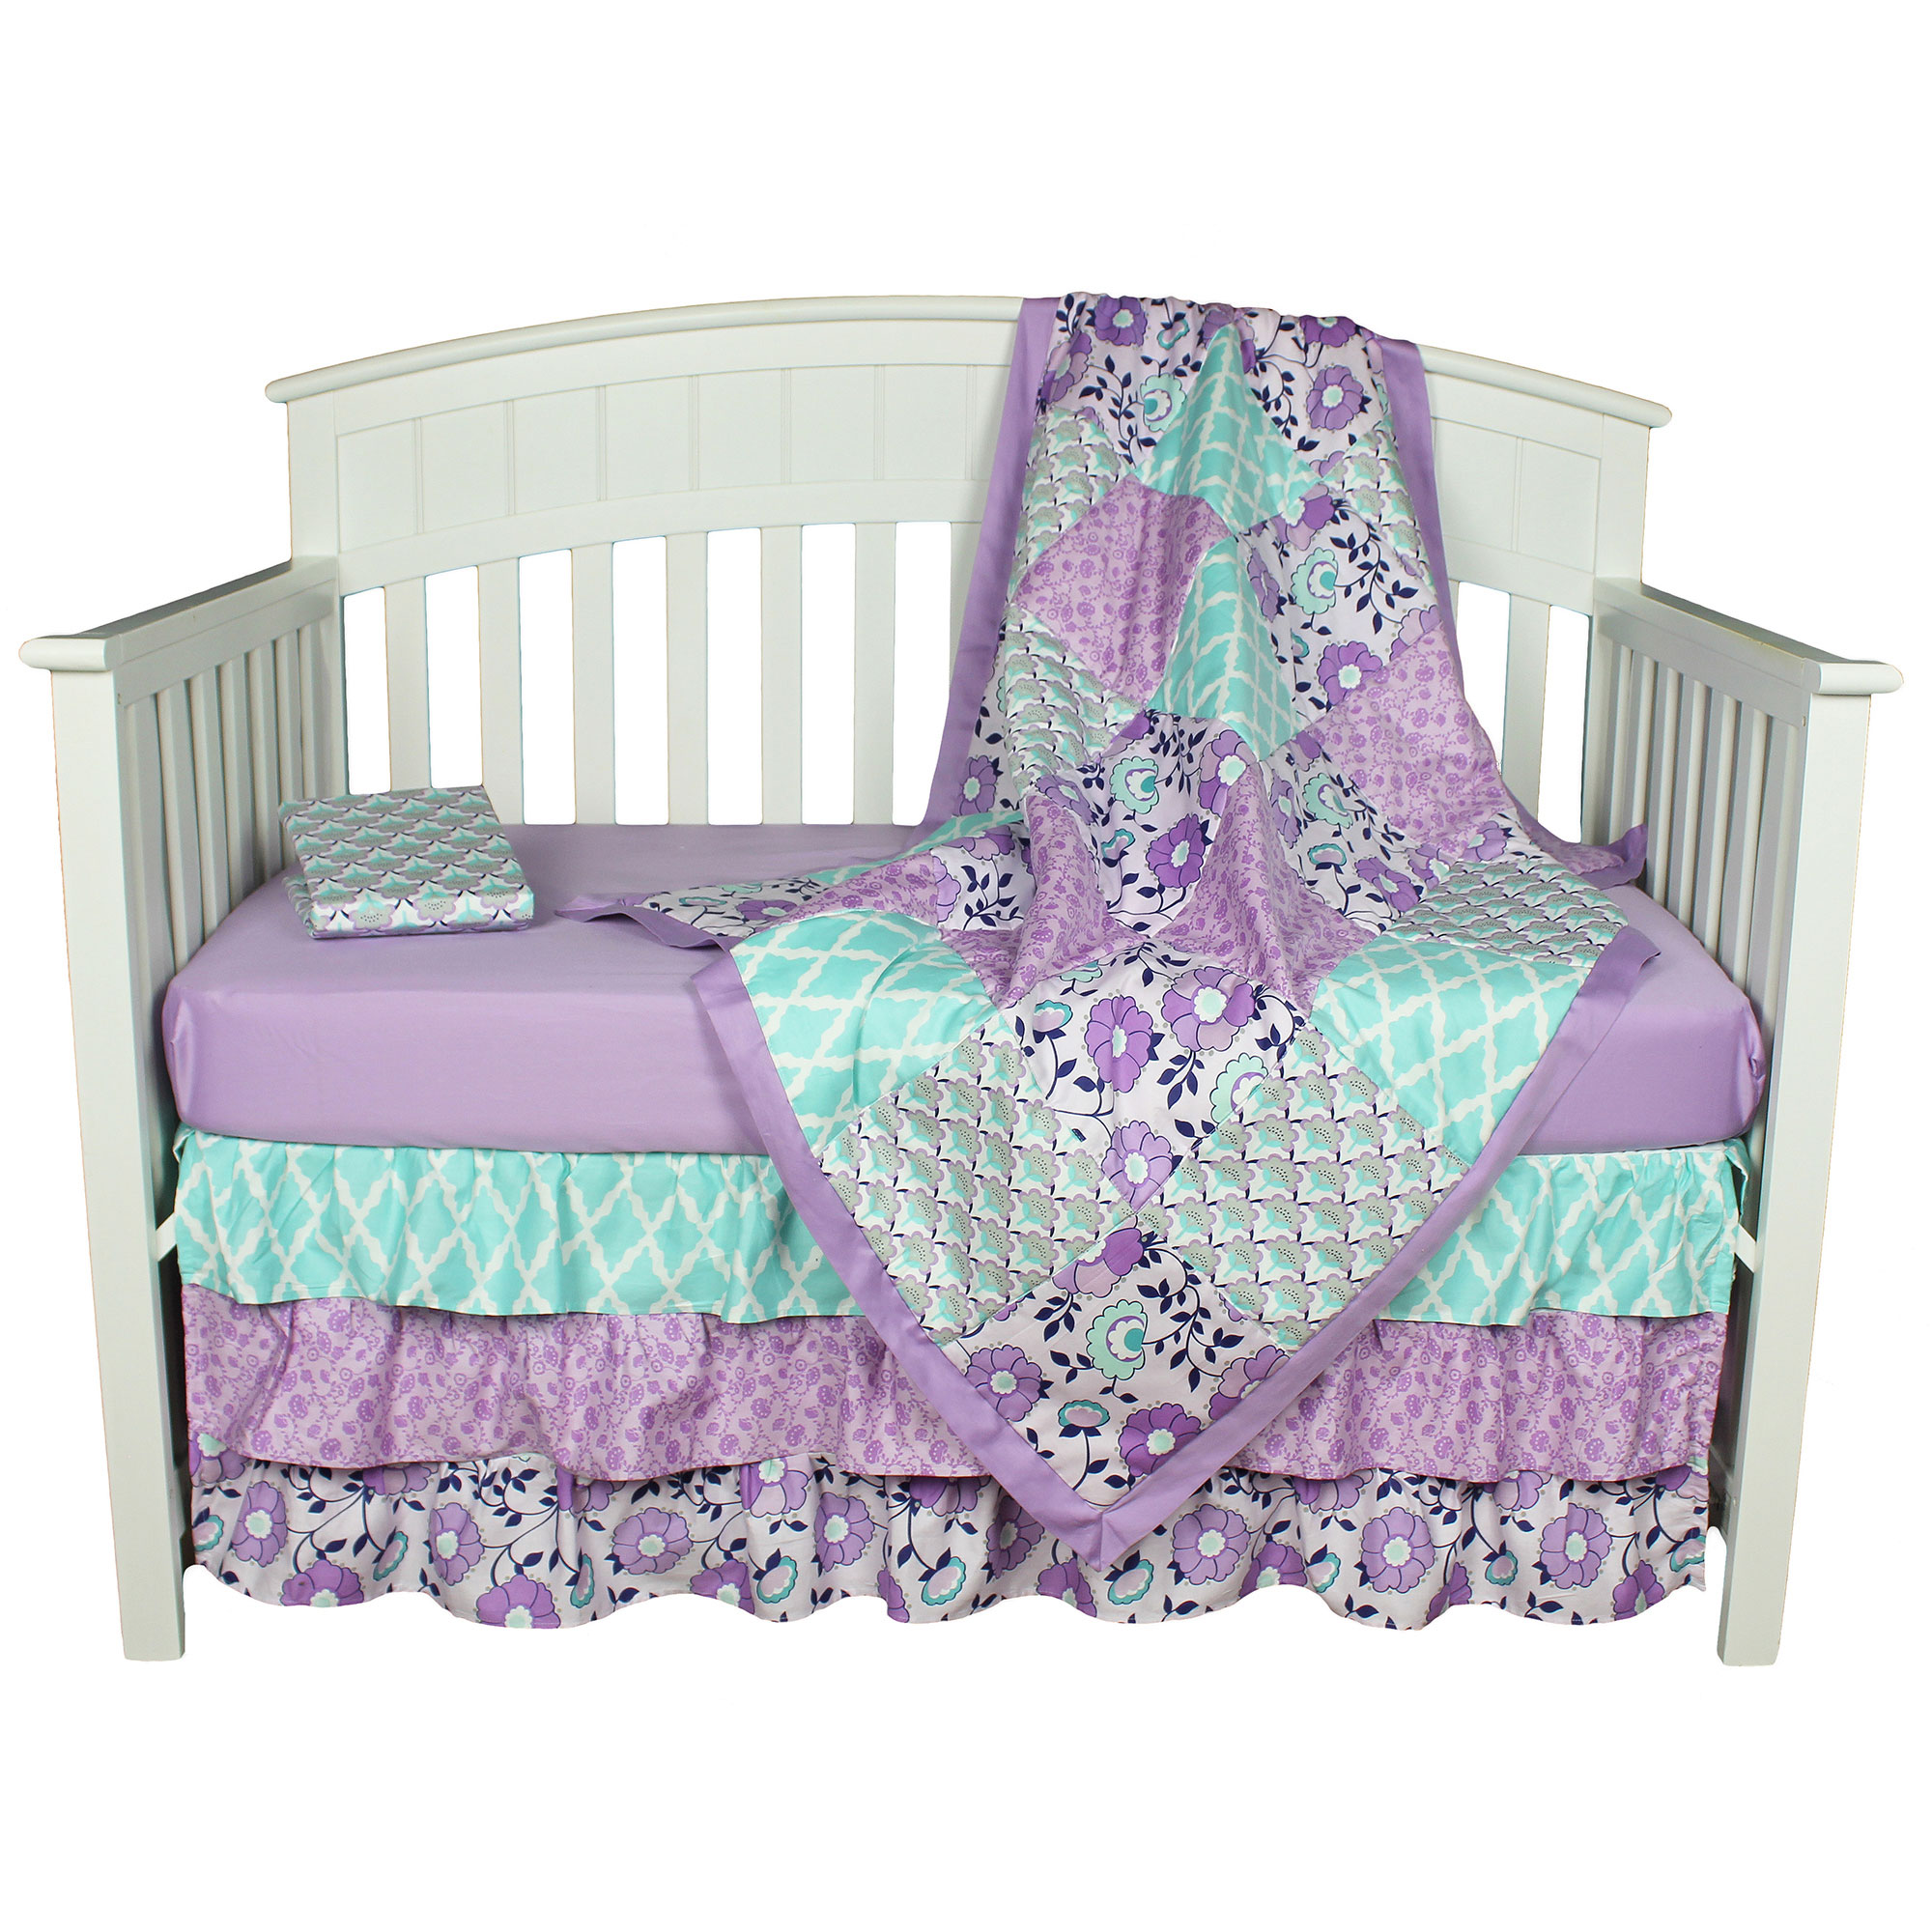 Zoe Floral Purple and Aqua Baby Girl Crib Bedding - 21 Piece Nursery Essentials Set